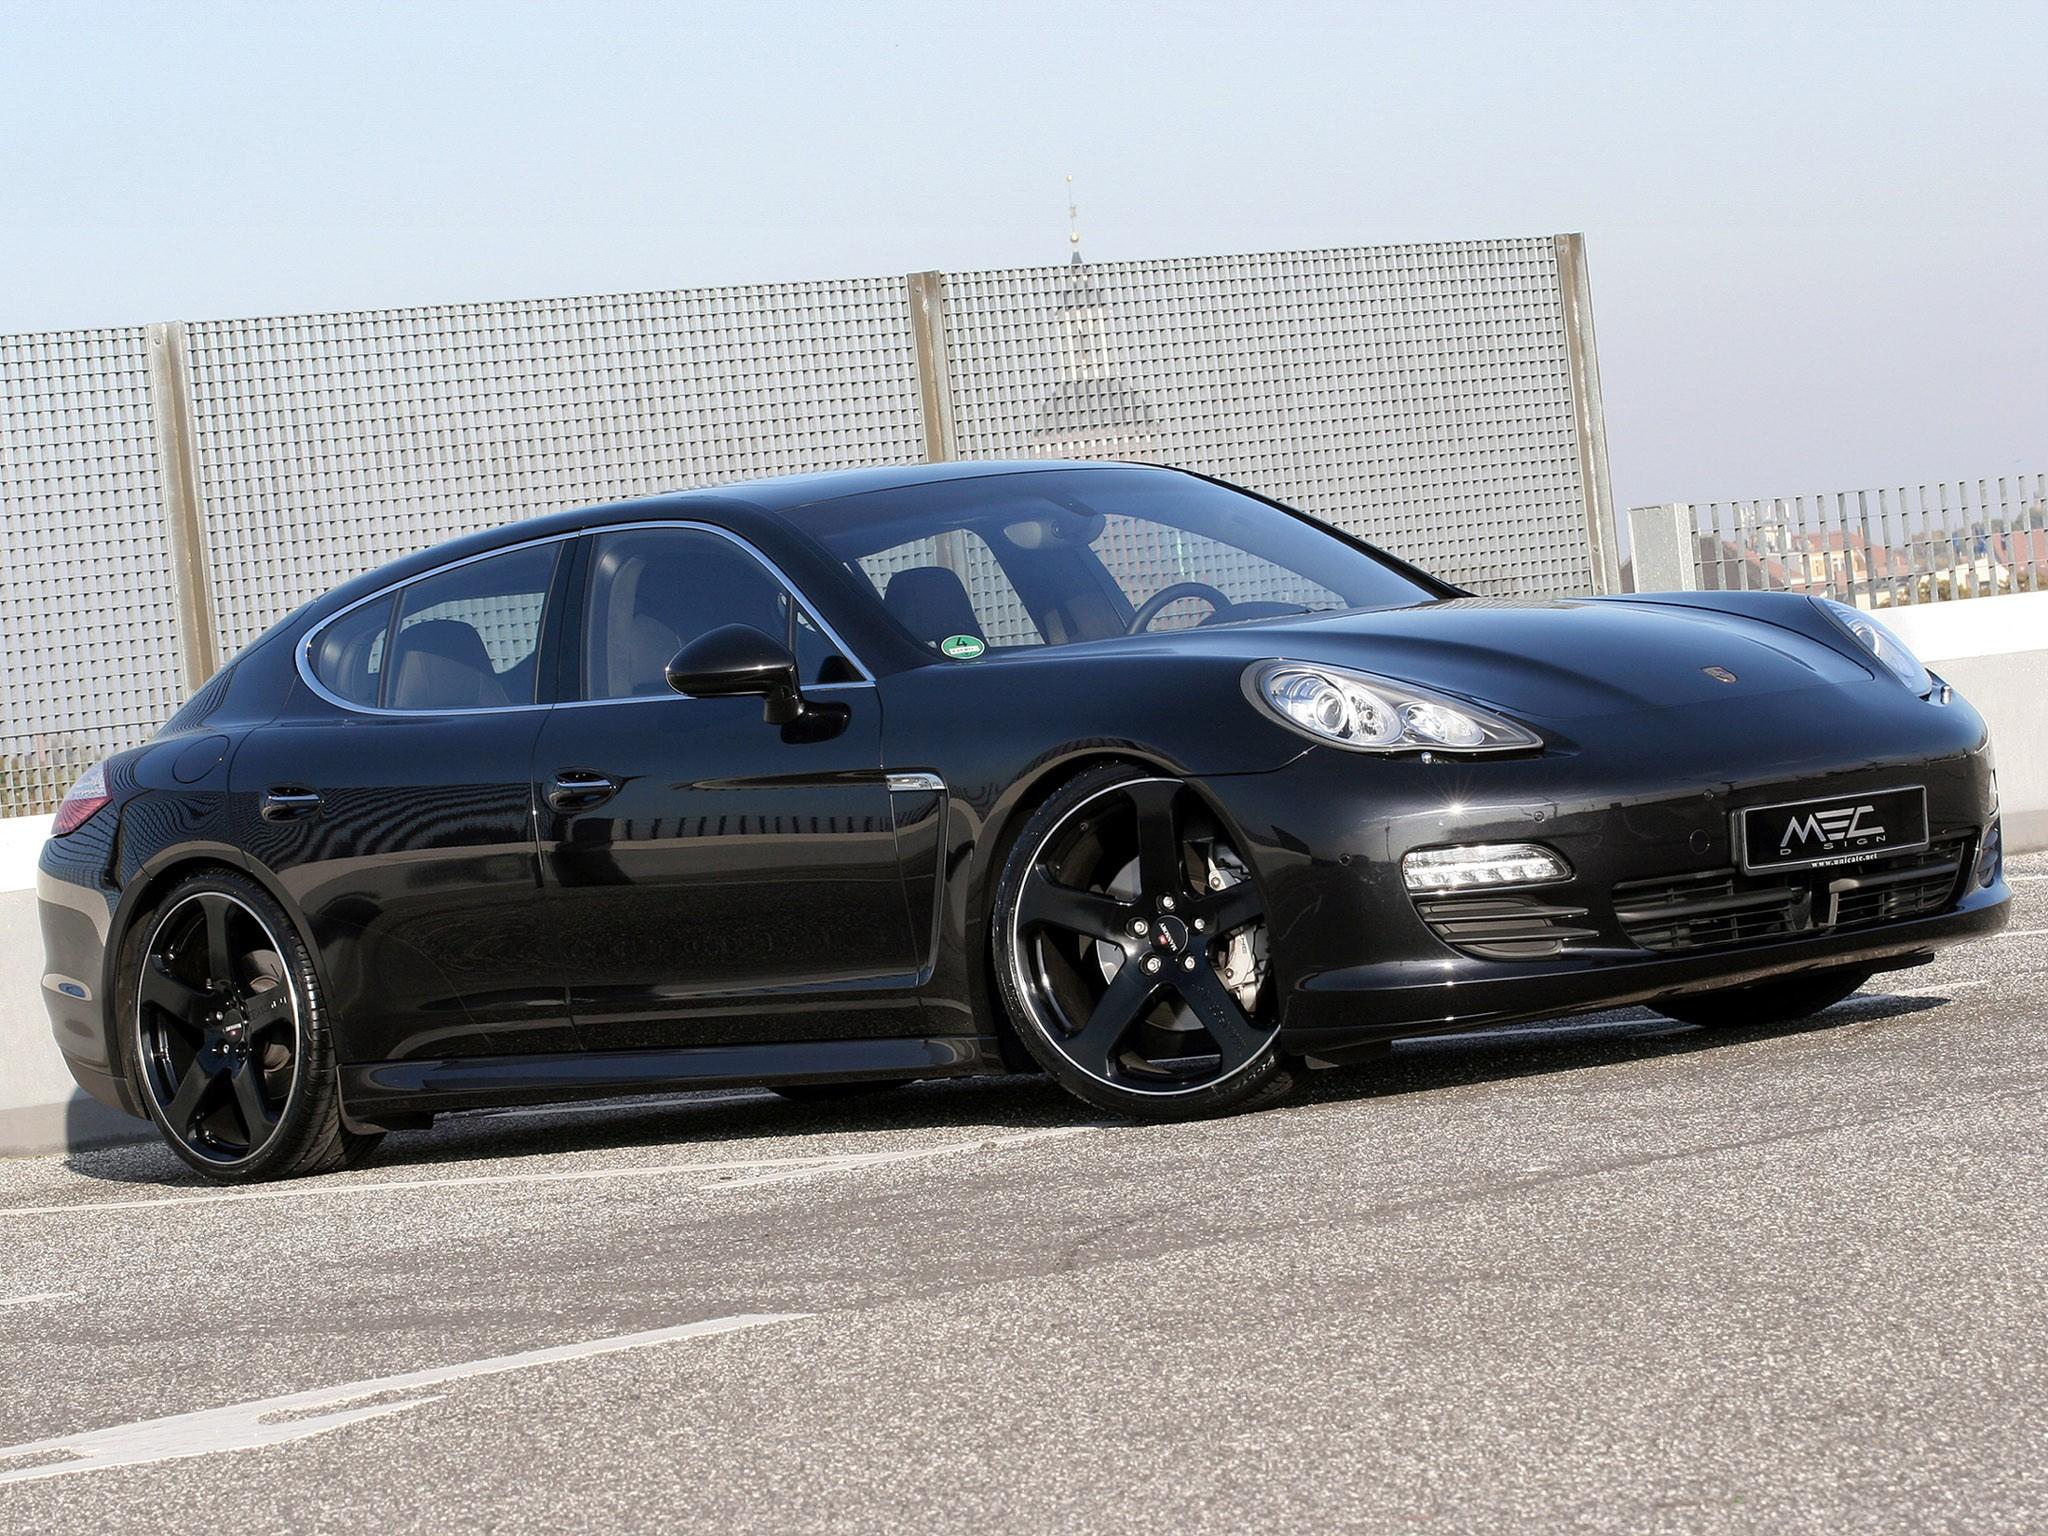 2010 Mec Design - Porsche Panamera S 970